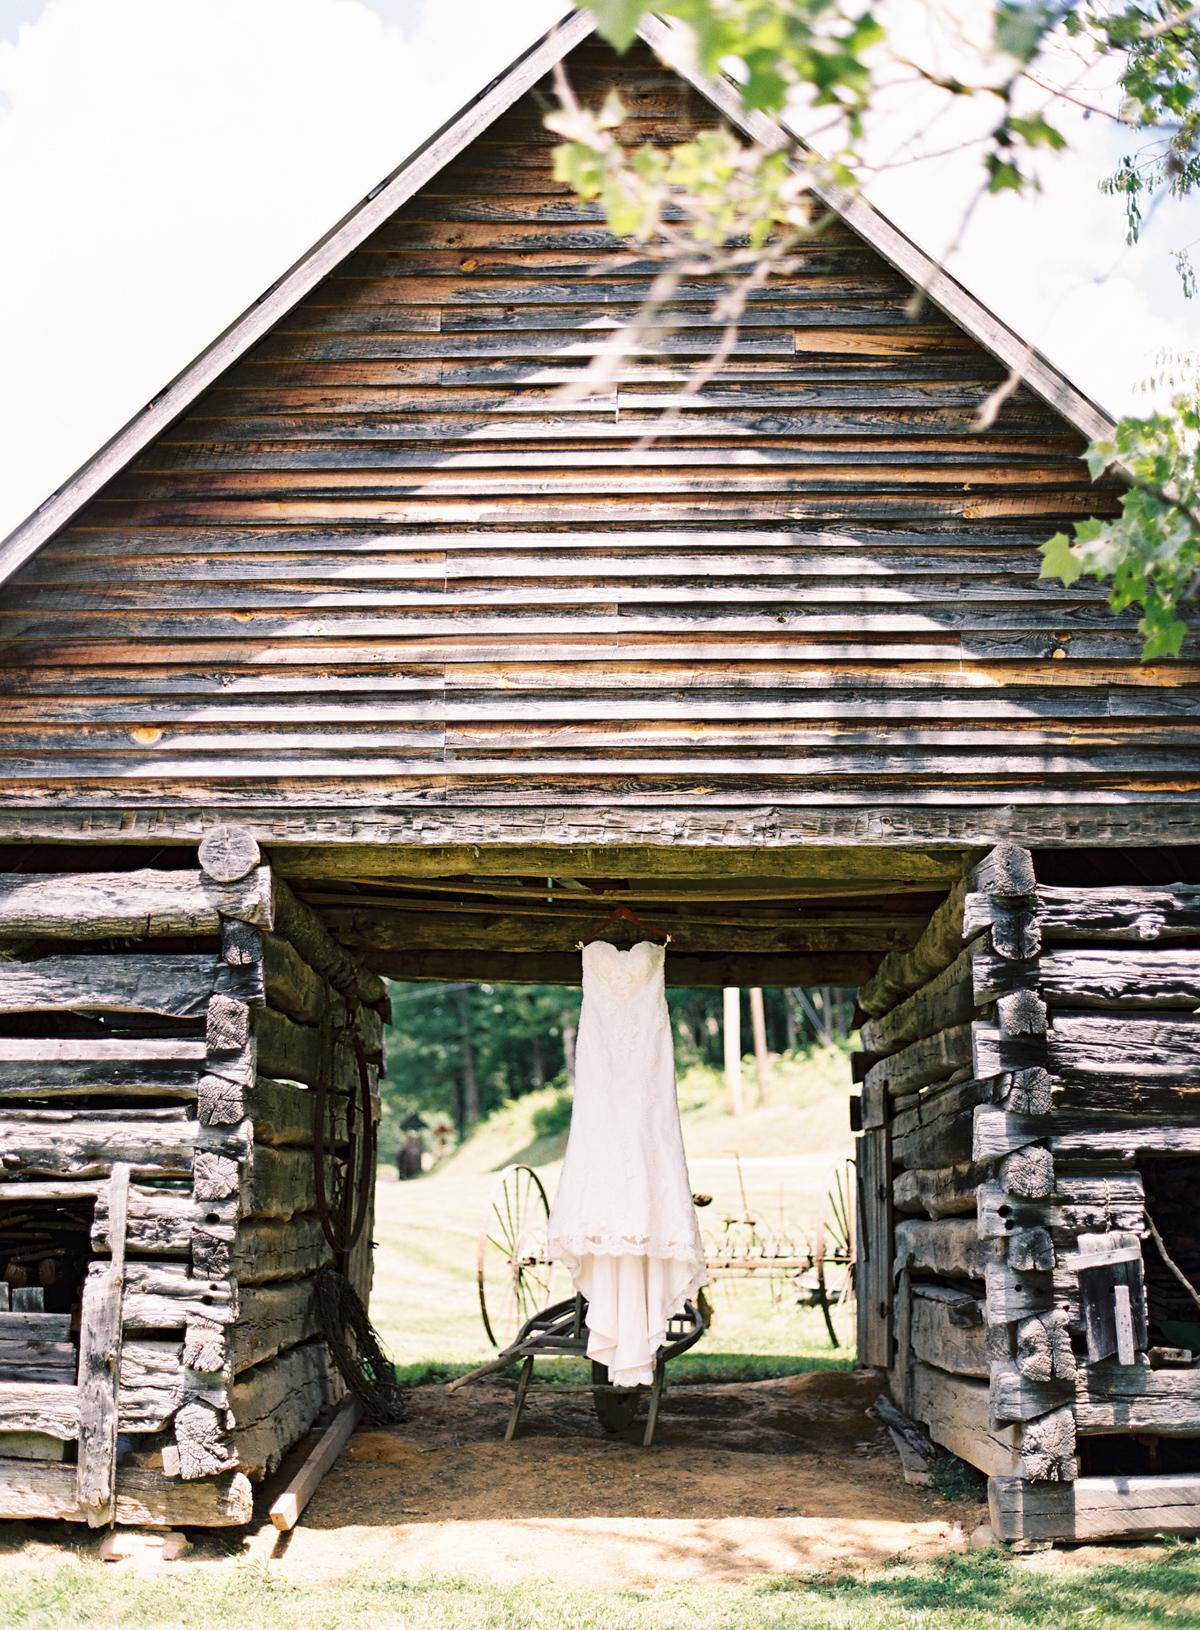 mcguires-millrace-farm-wedding-001.jpg